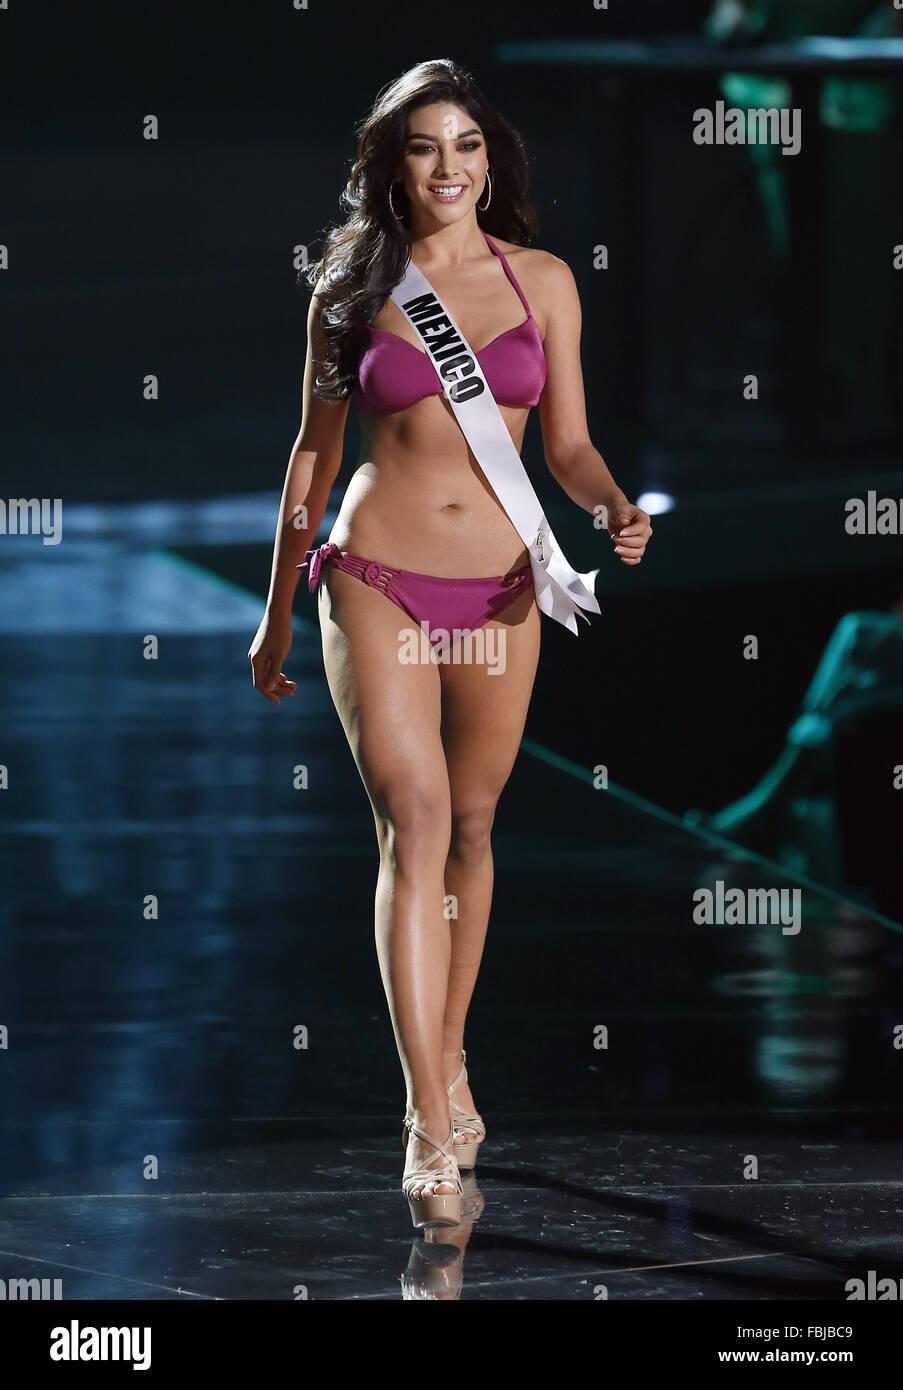 Stephanie Pratt nudes (32 photos), Ass, Sideboobs, Boobs, braless 2019